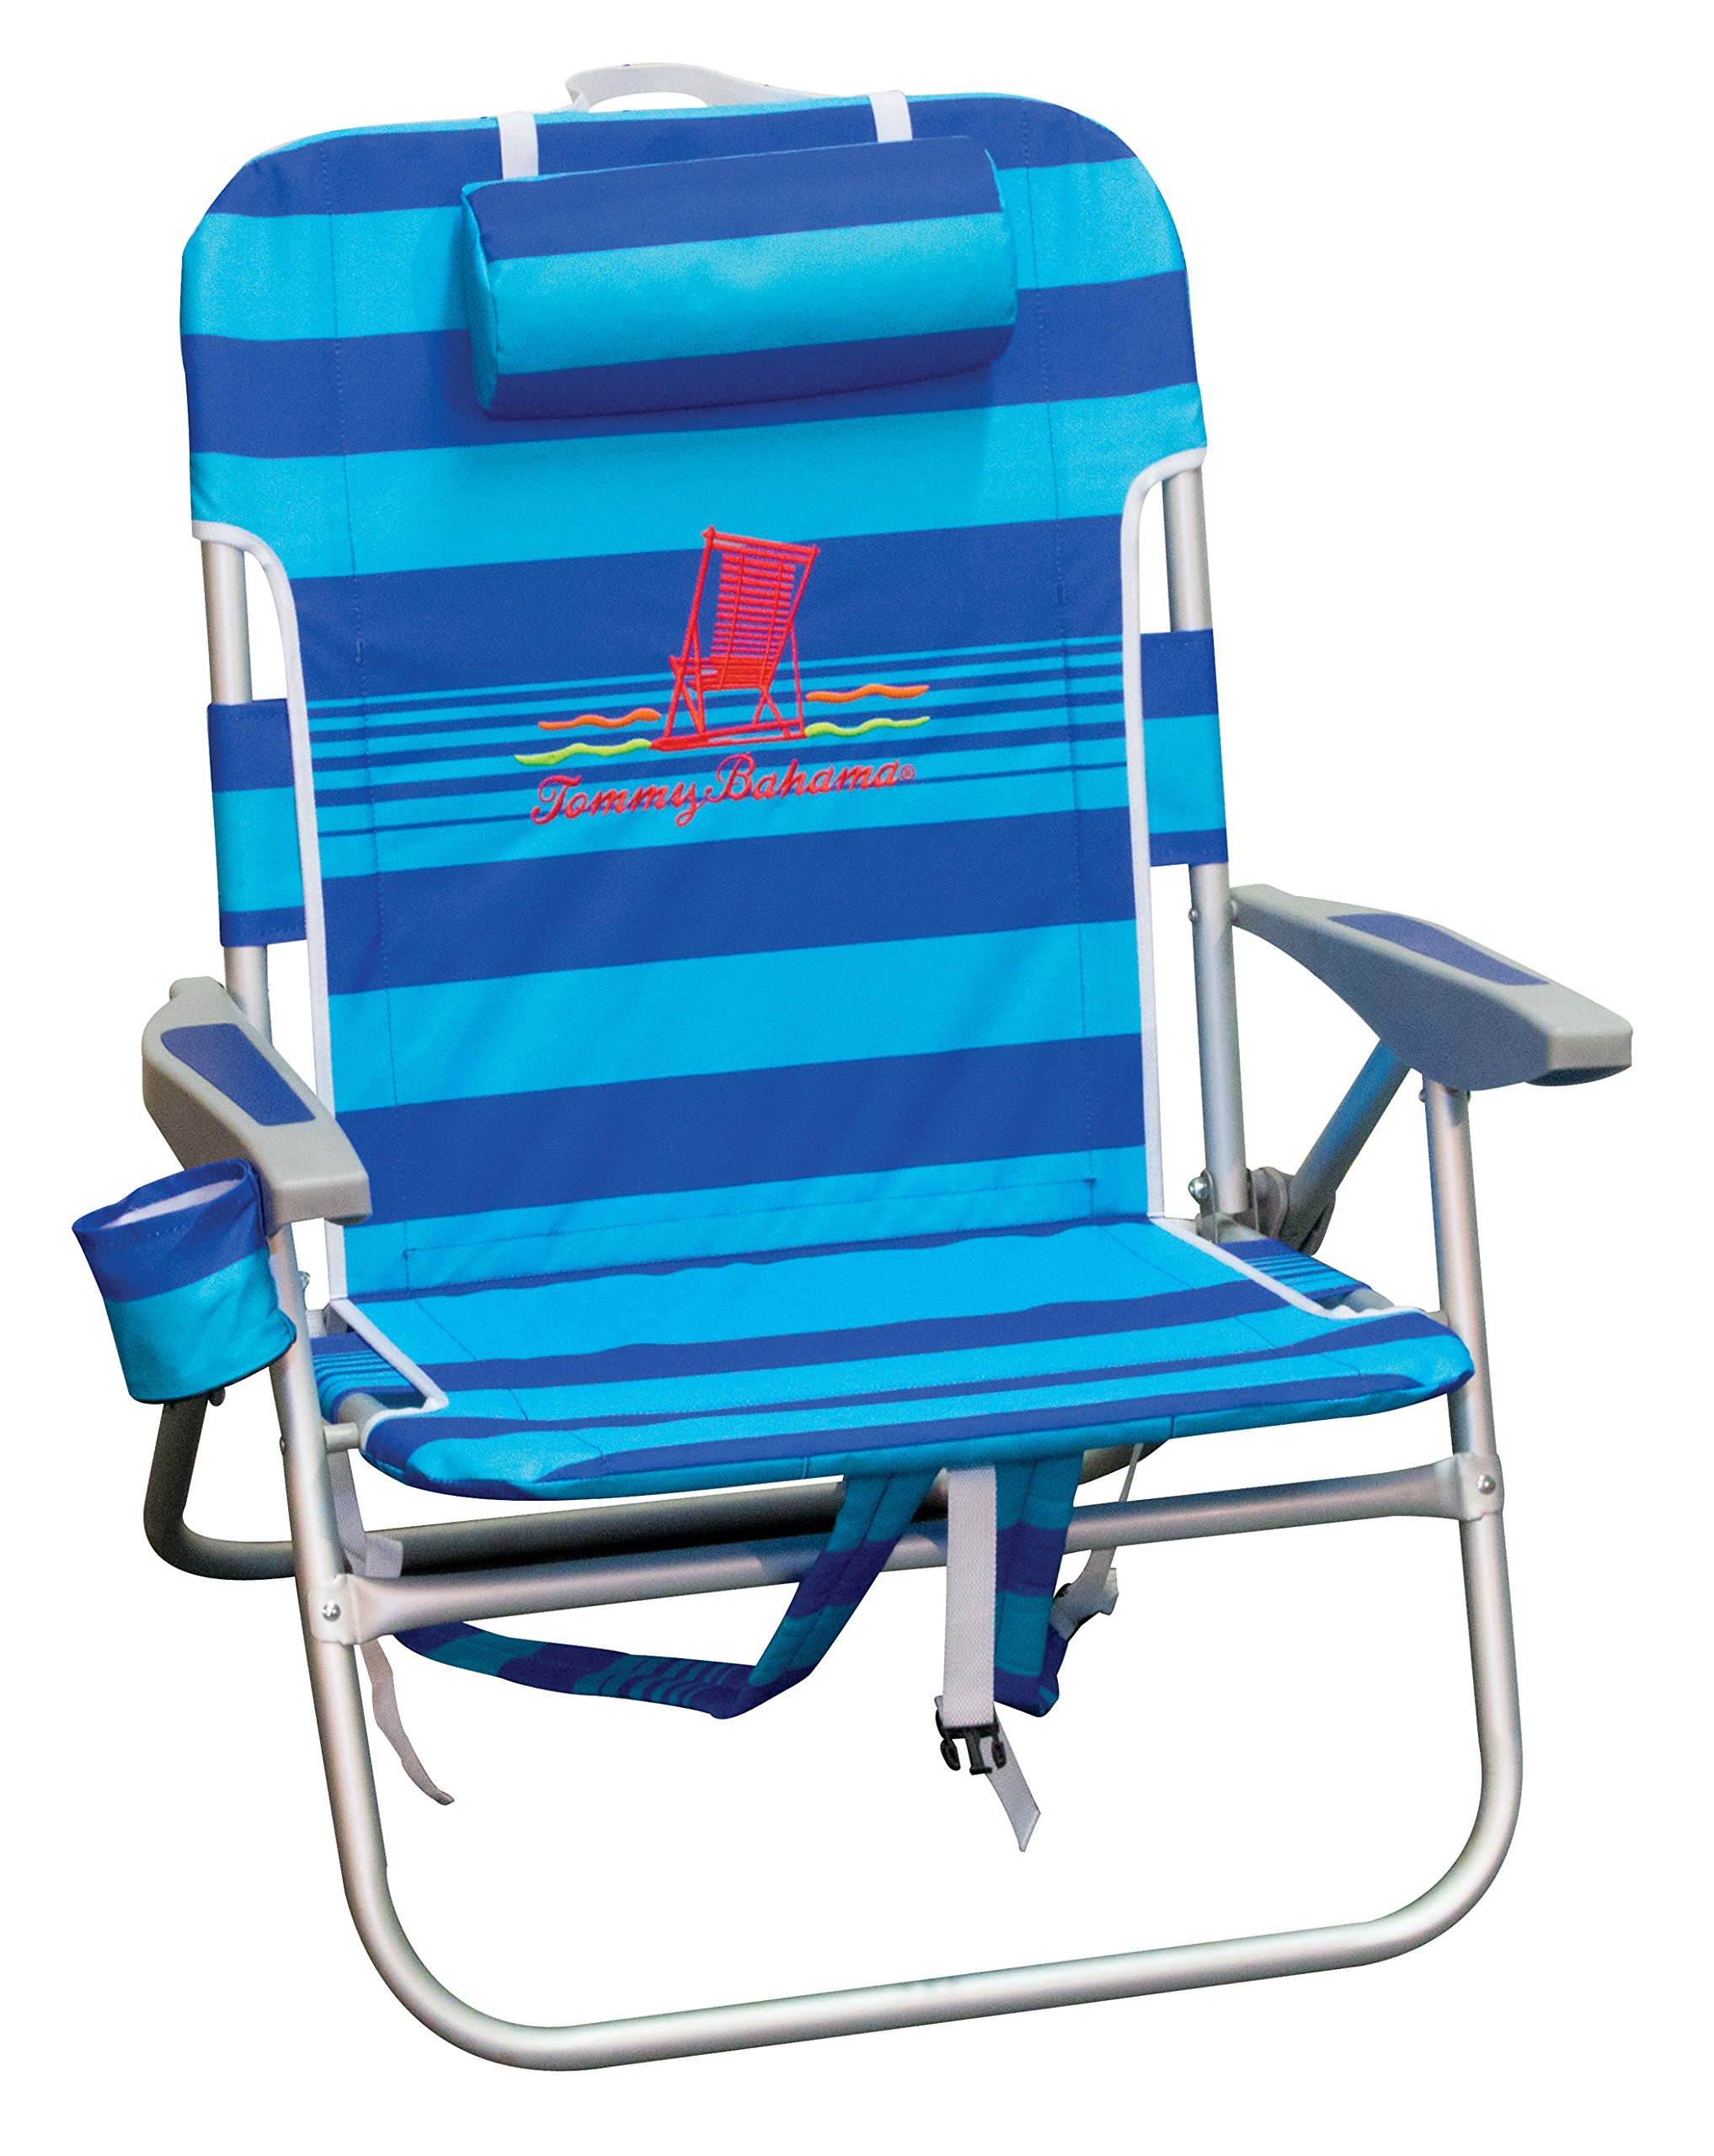 Tommy Bahama ASC537TB-182-1 Big Boy Backpack Beach Chair, Blue Stripe